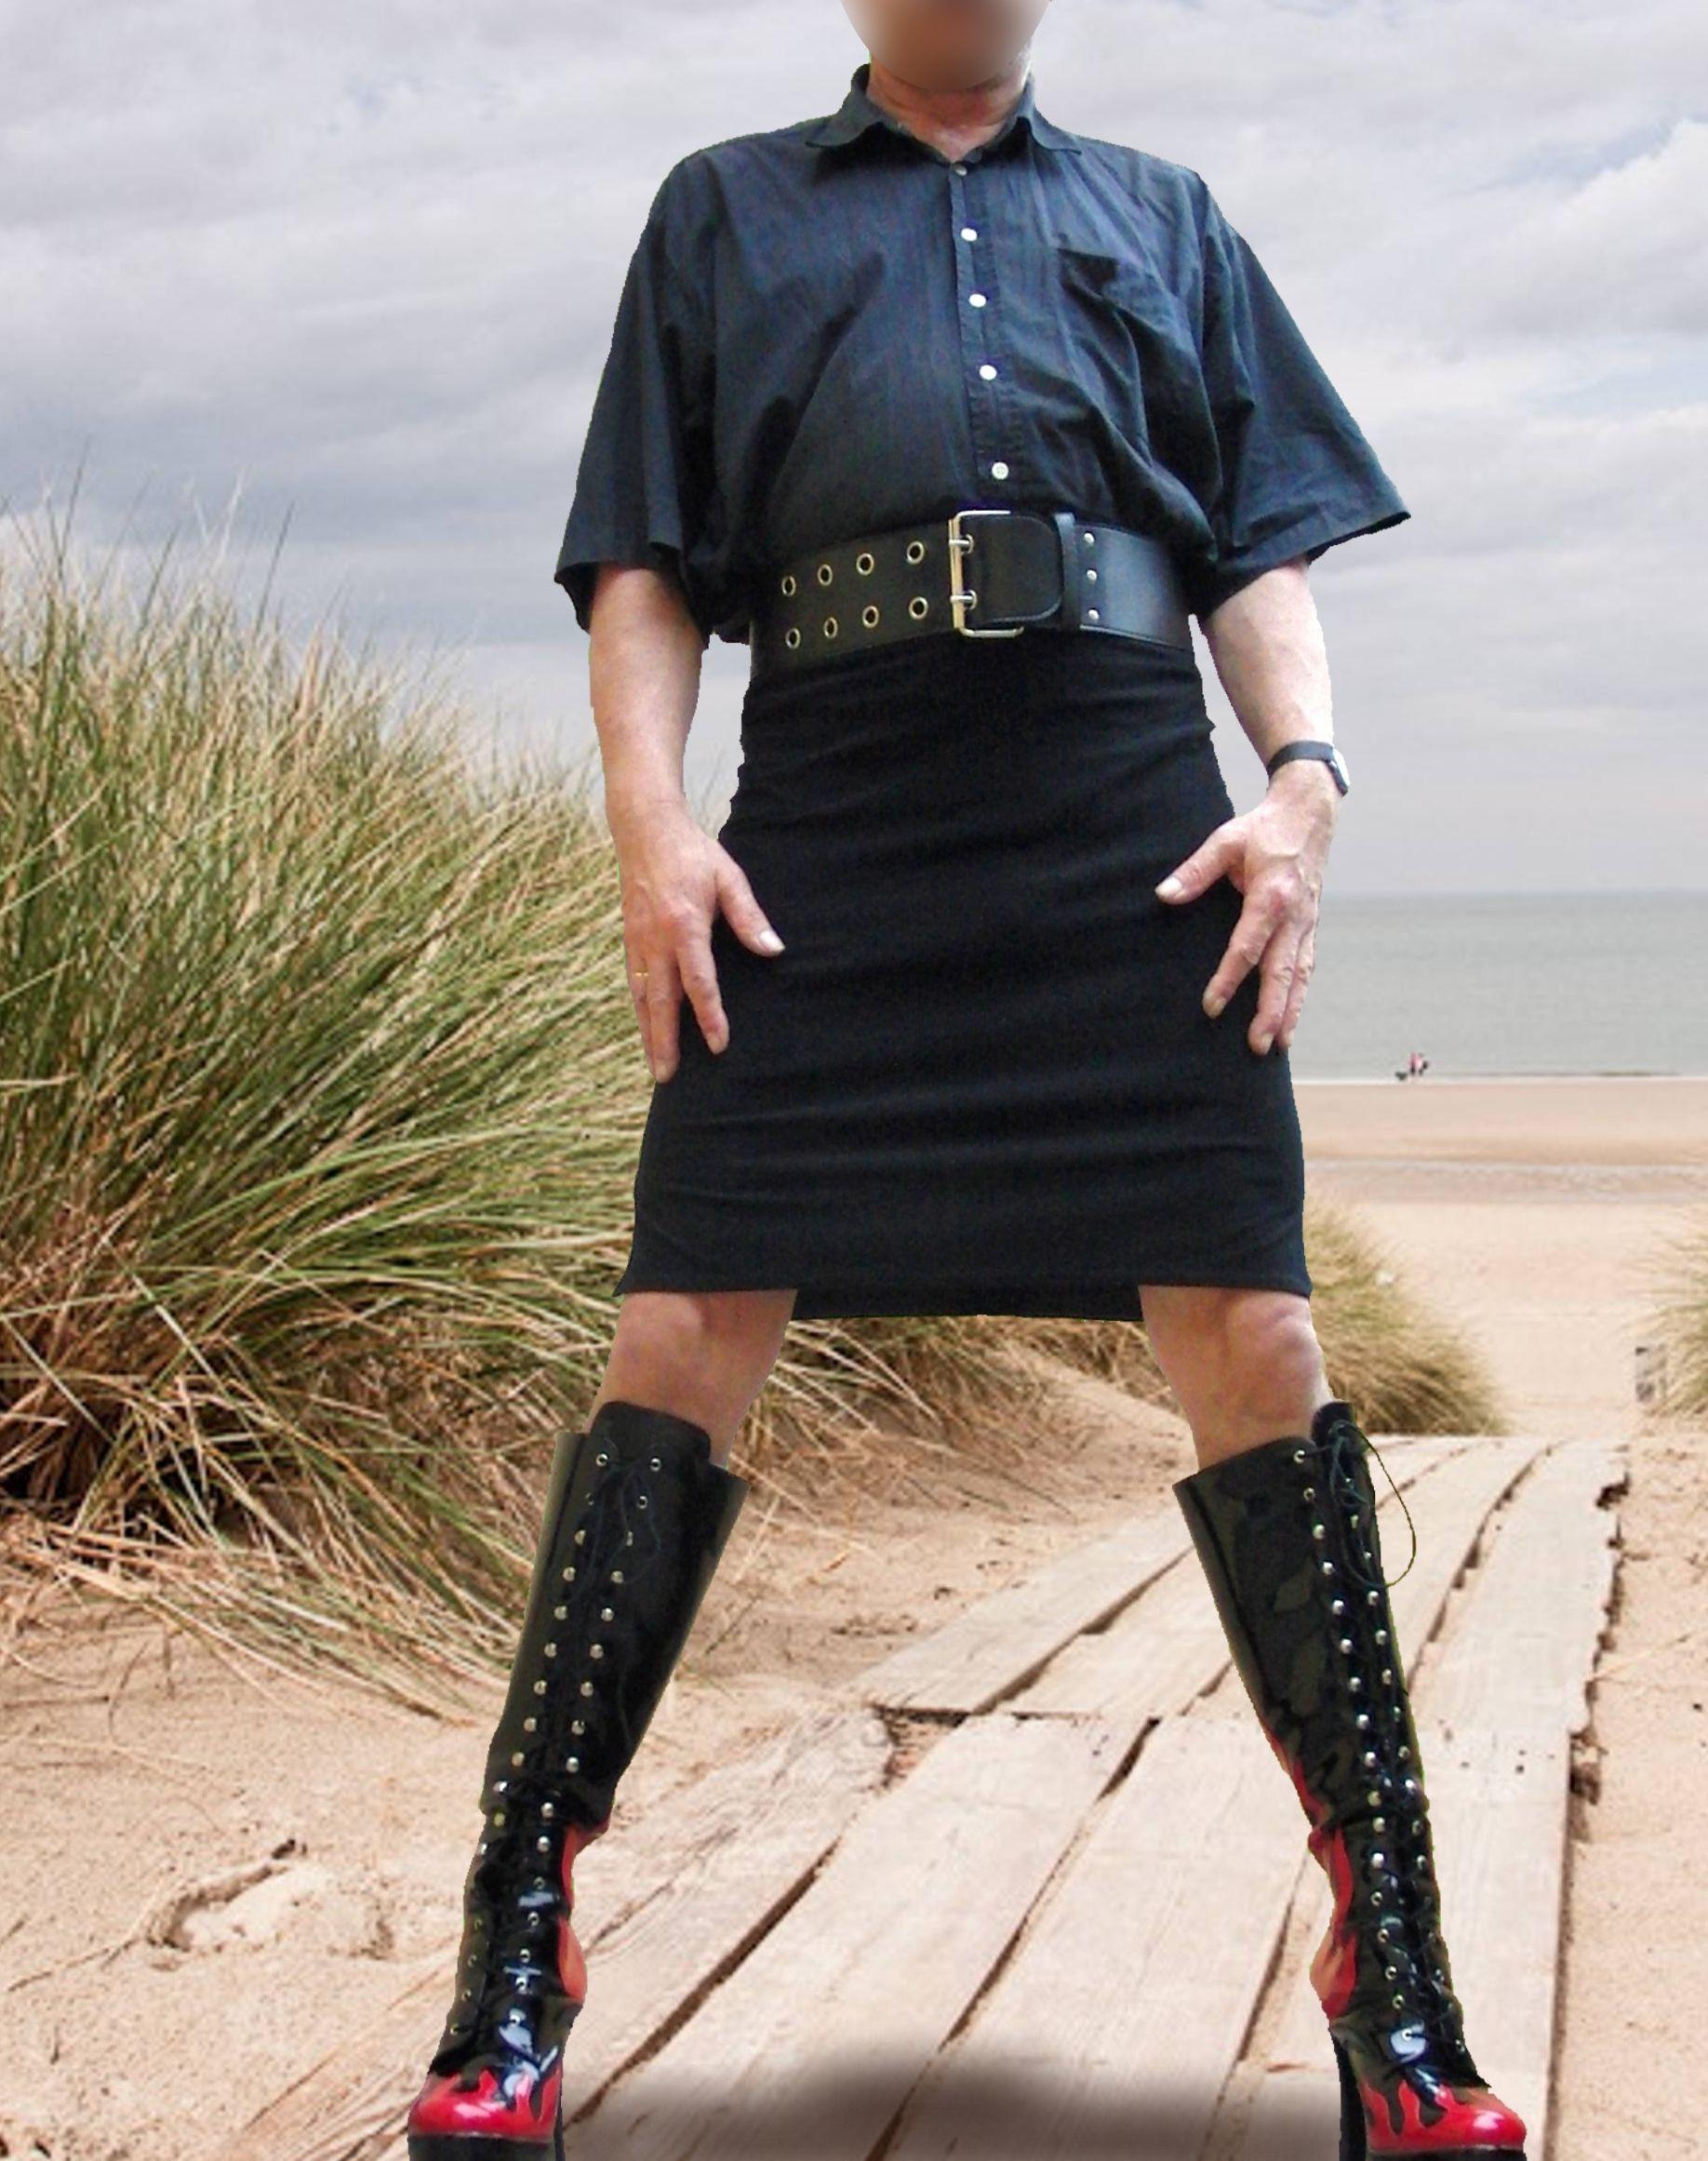 Cooles Outfit für Männer | Mode röcke, Herrenkleidung